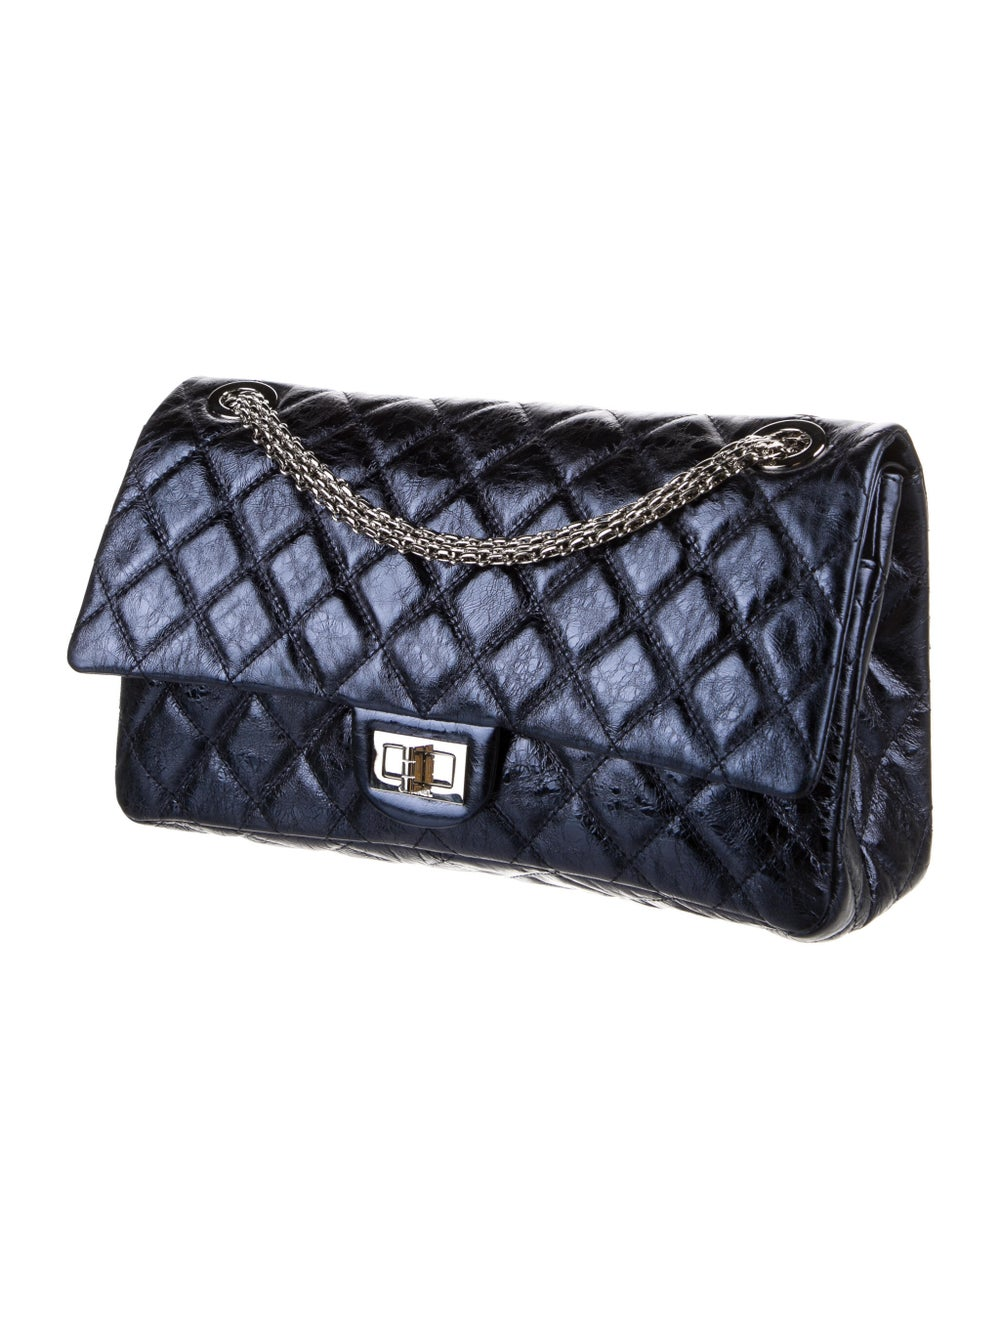 Chanel Reissue 228 Double Flap Bag Blue - image 3